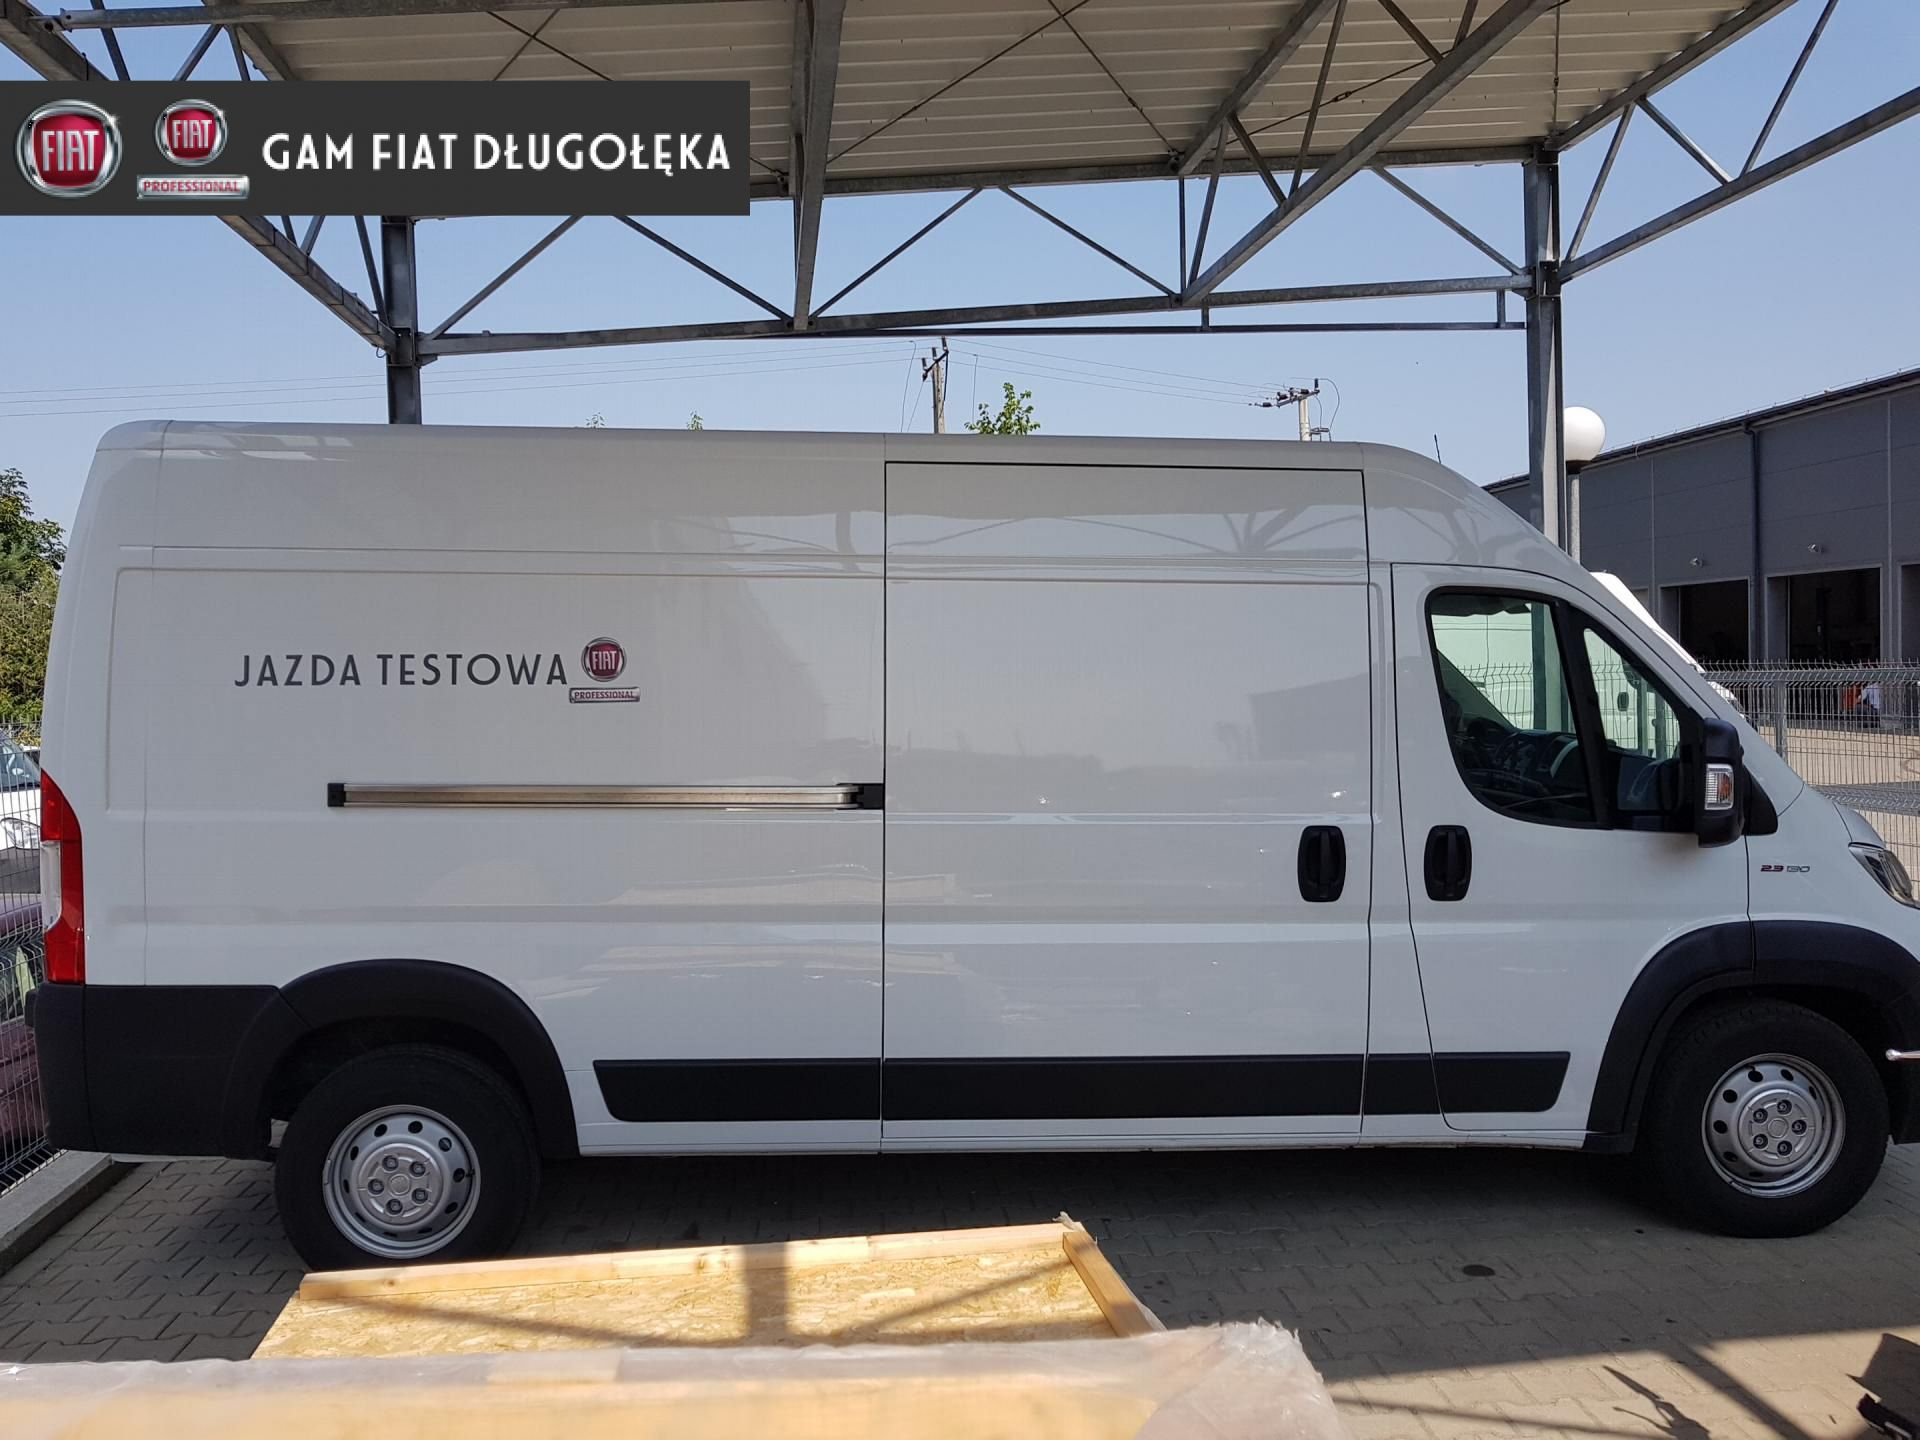 Unikalne Fiat Ducato Fiat Ducato 130KM L3H2 MAXI wersja DEMO od ręki, GAM KS12